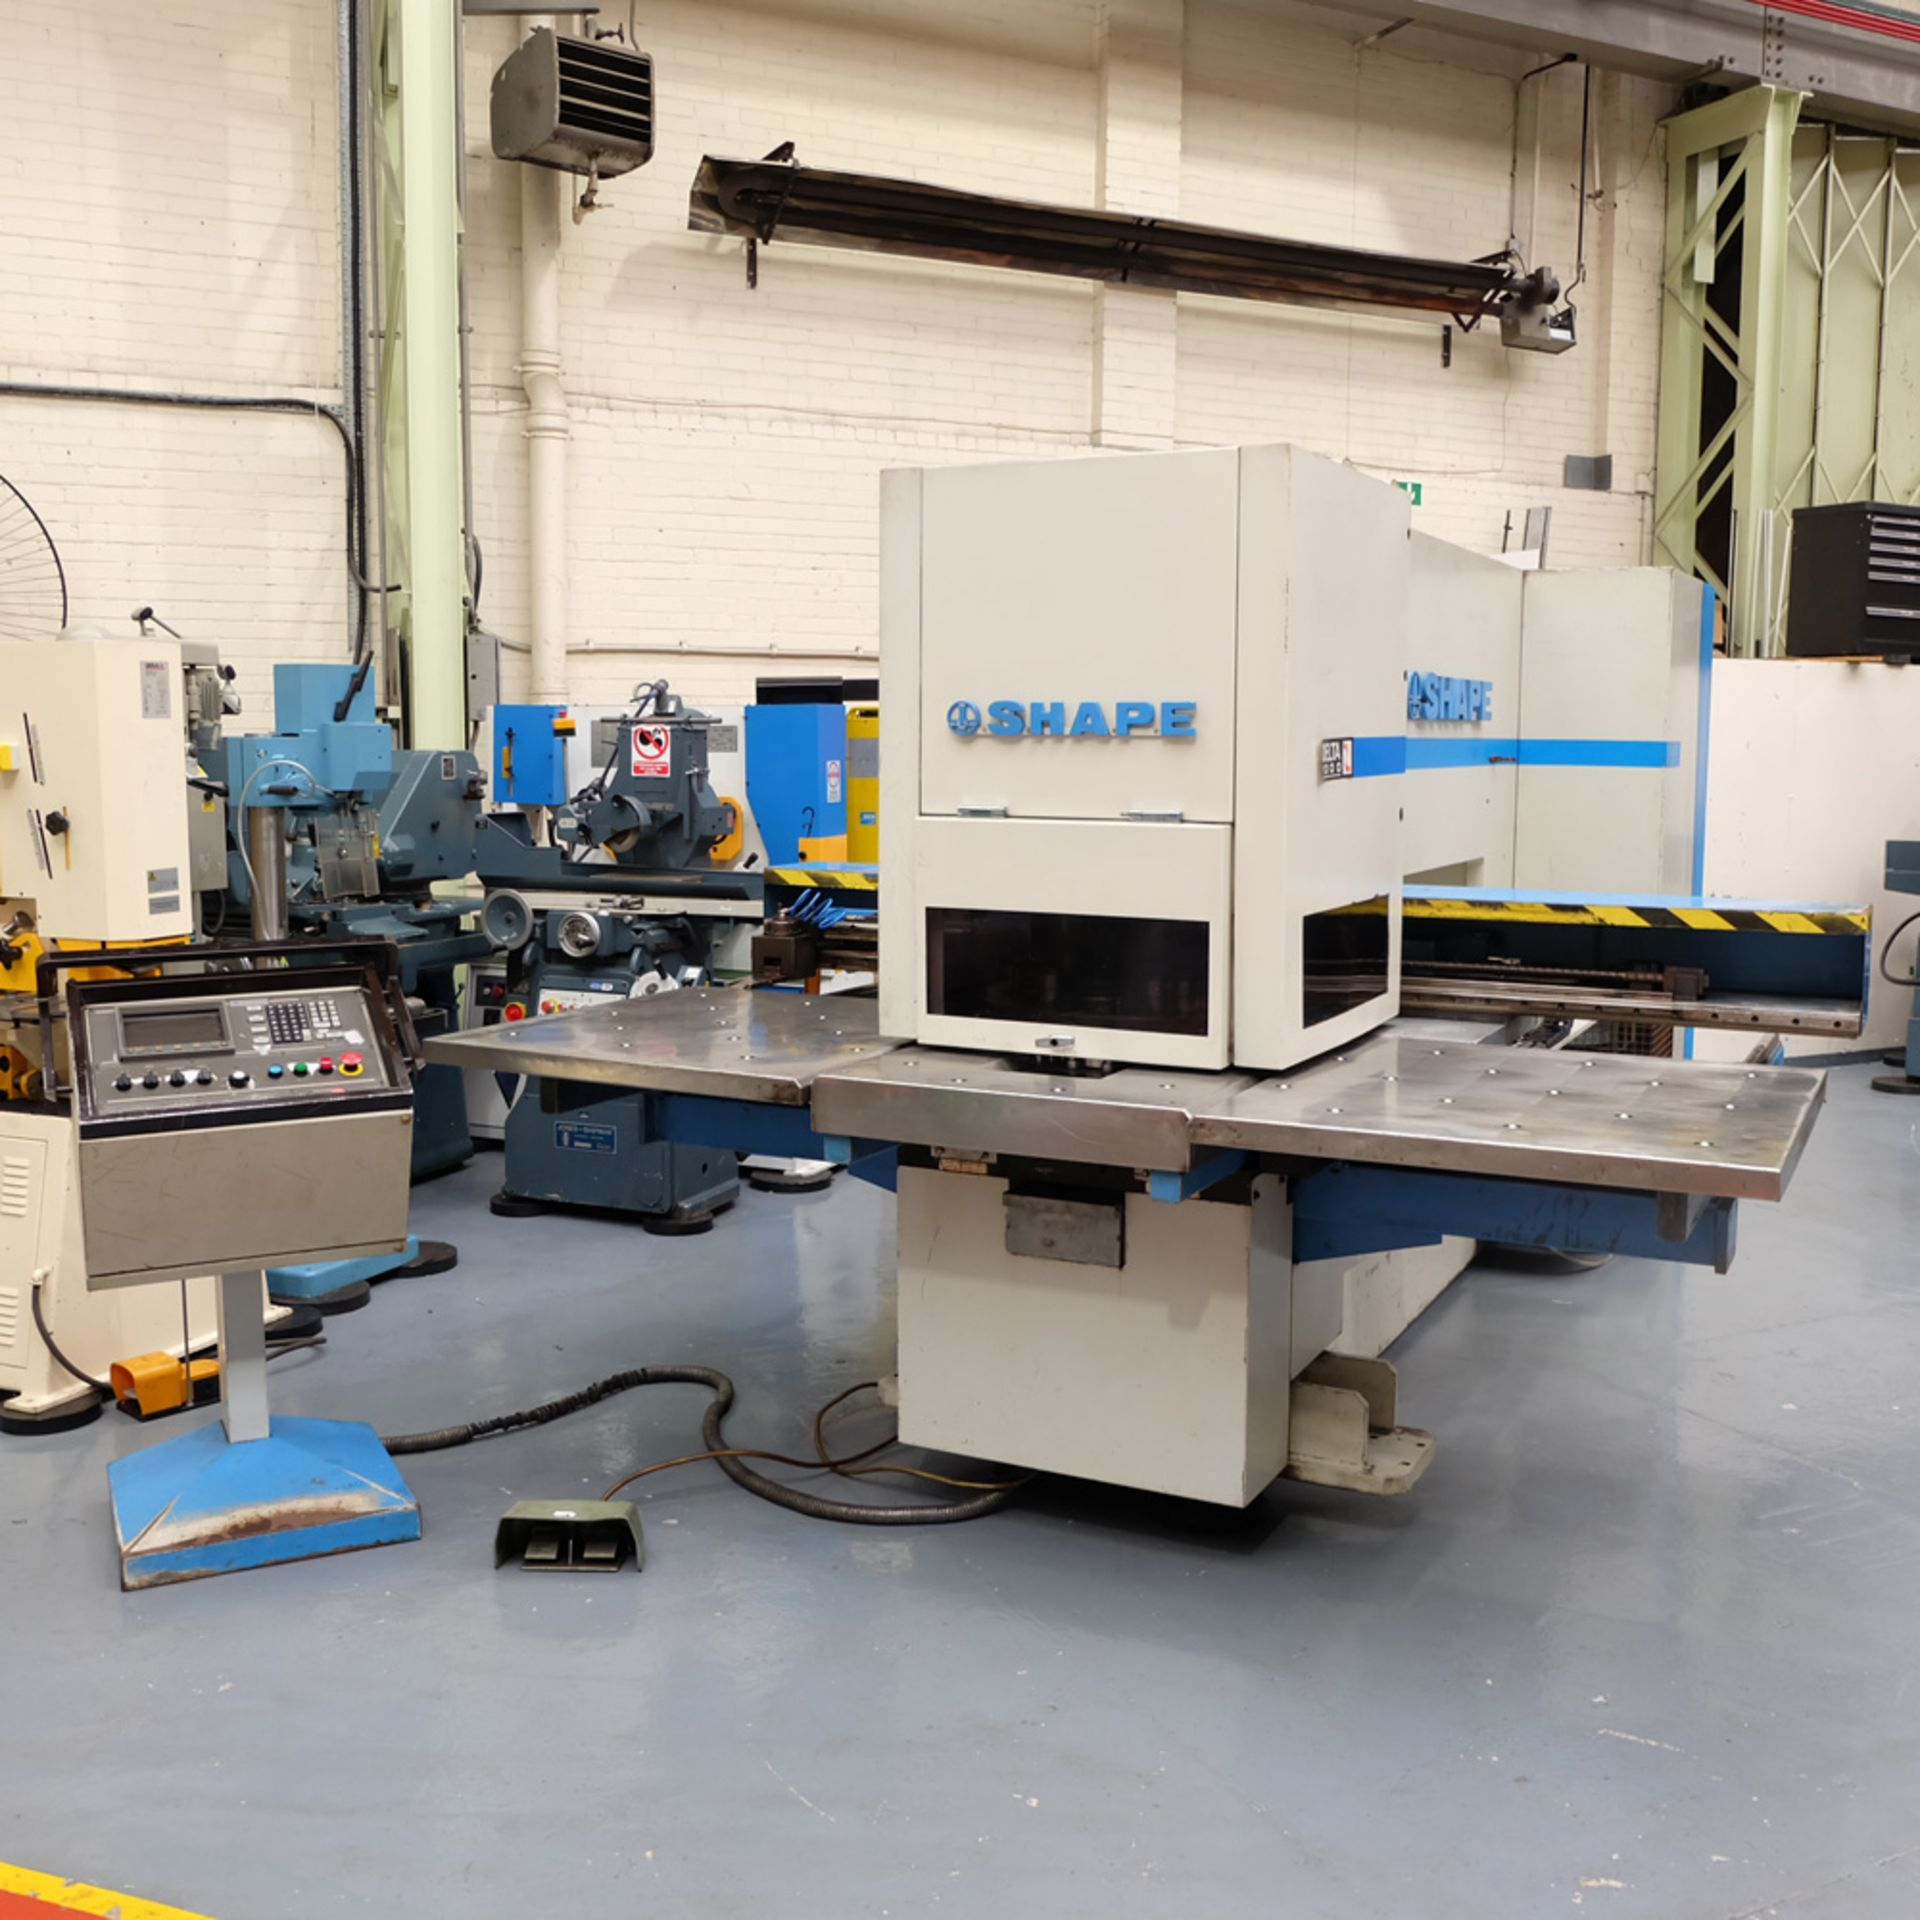 LVD Shape Delta 1000 Thick CNC Turret Punching Machine. - Image 3 of 18